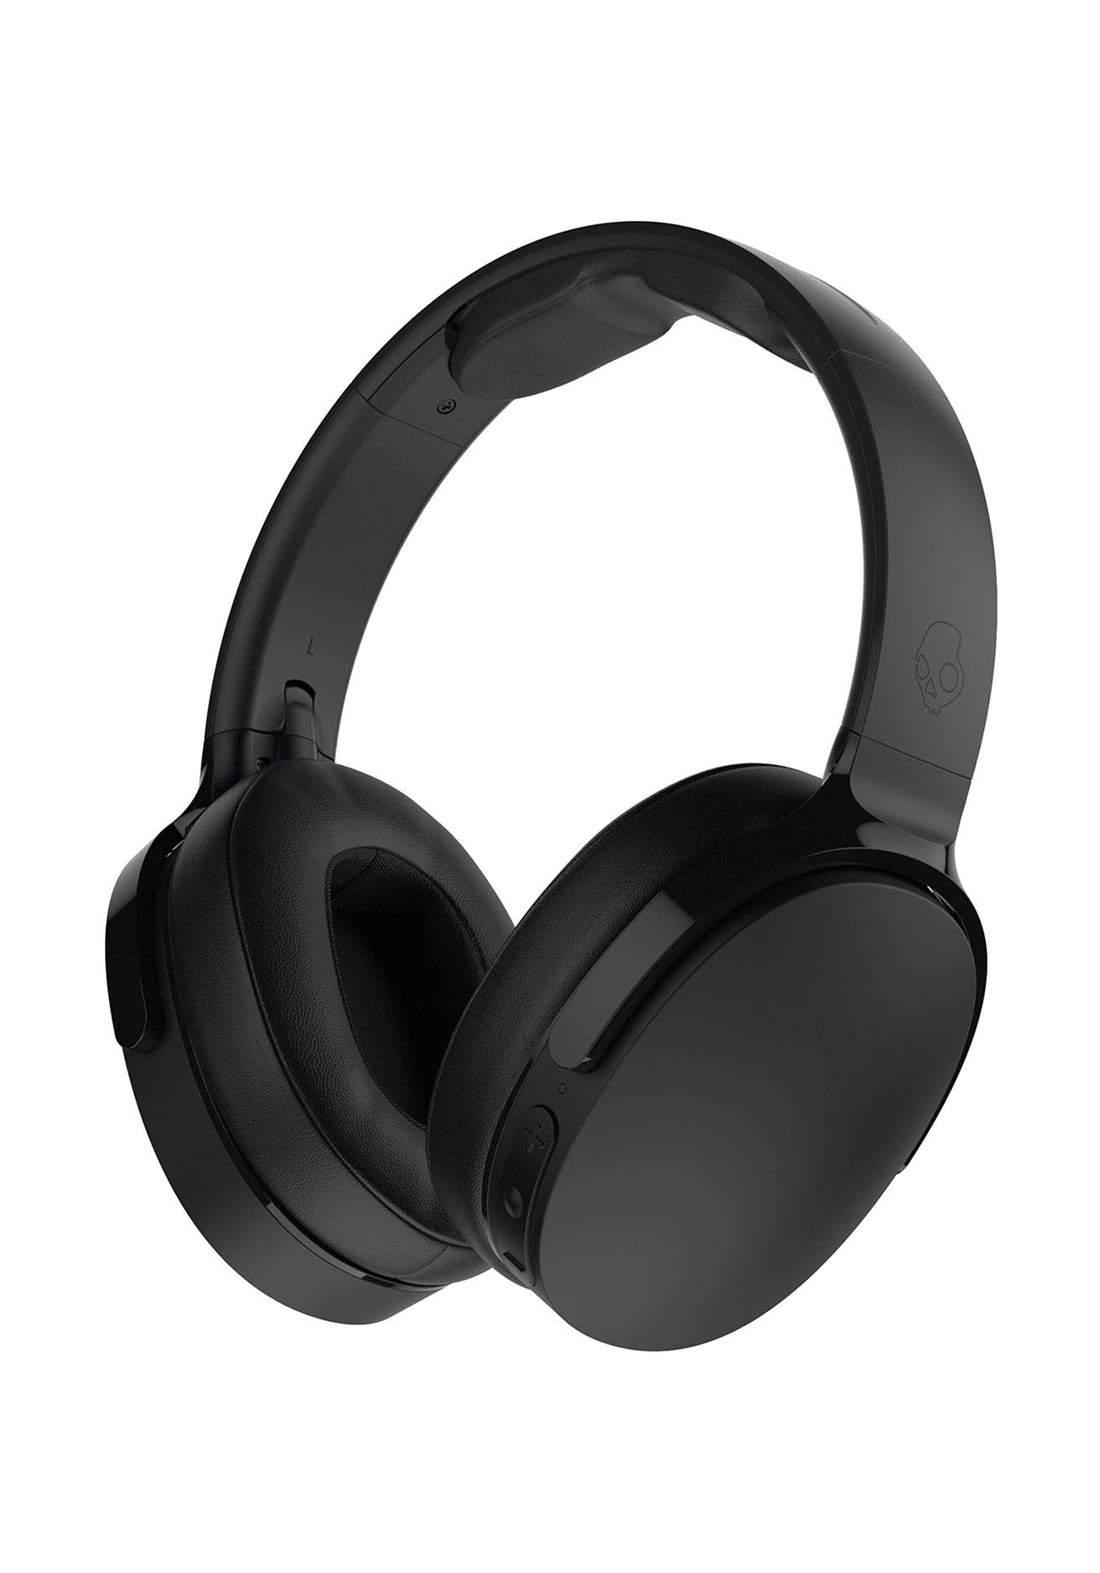 Skullcandy S6HTW-K033 Hesh 3 Bluetooth Wireless Headset - Black سماعة